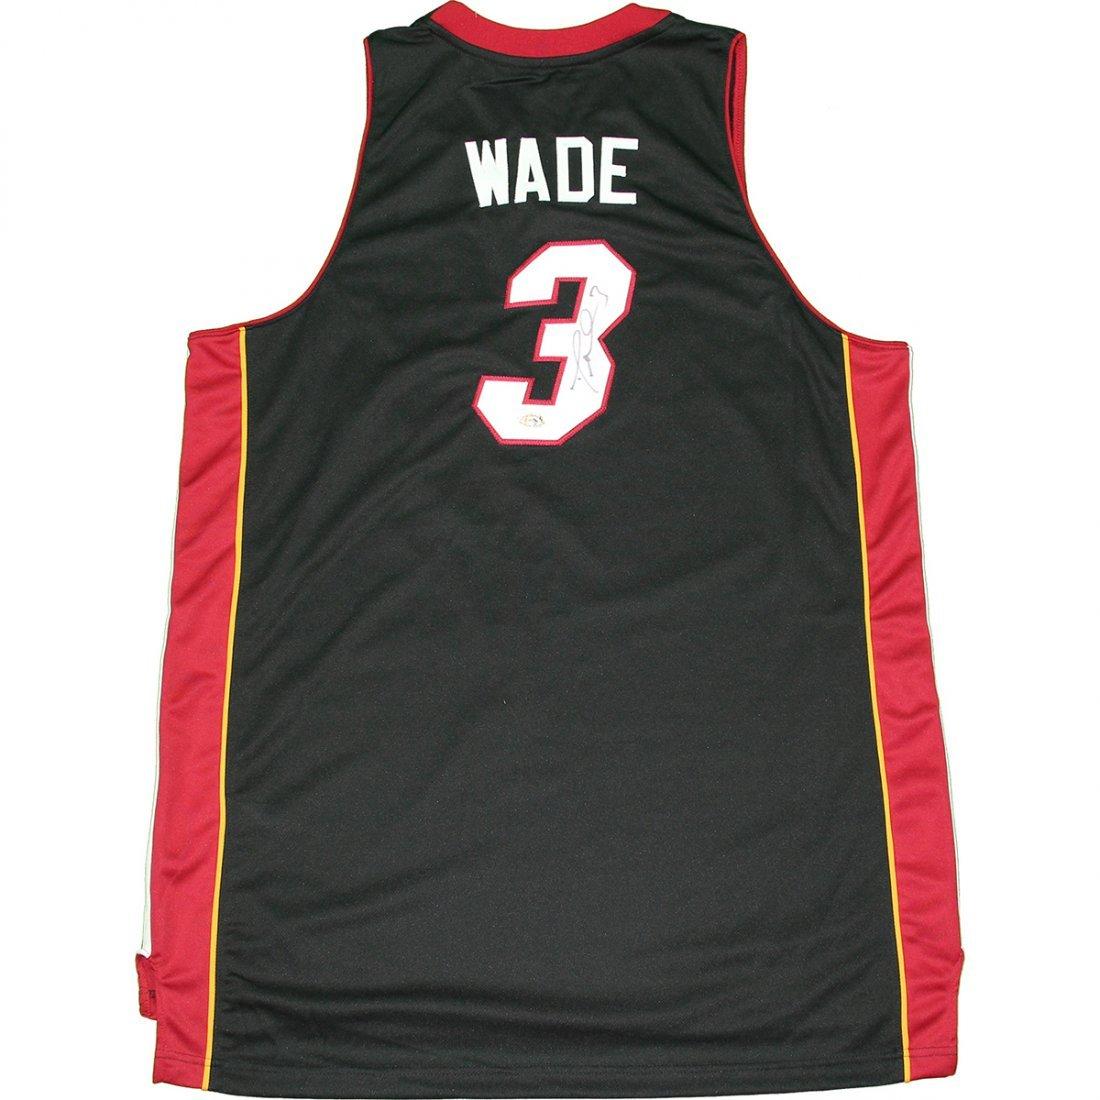 Dwayne Wade Signed Miami Heat Black Adidas Swingman Jer